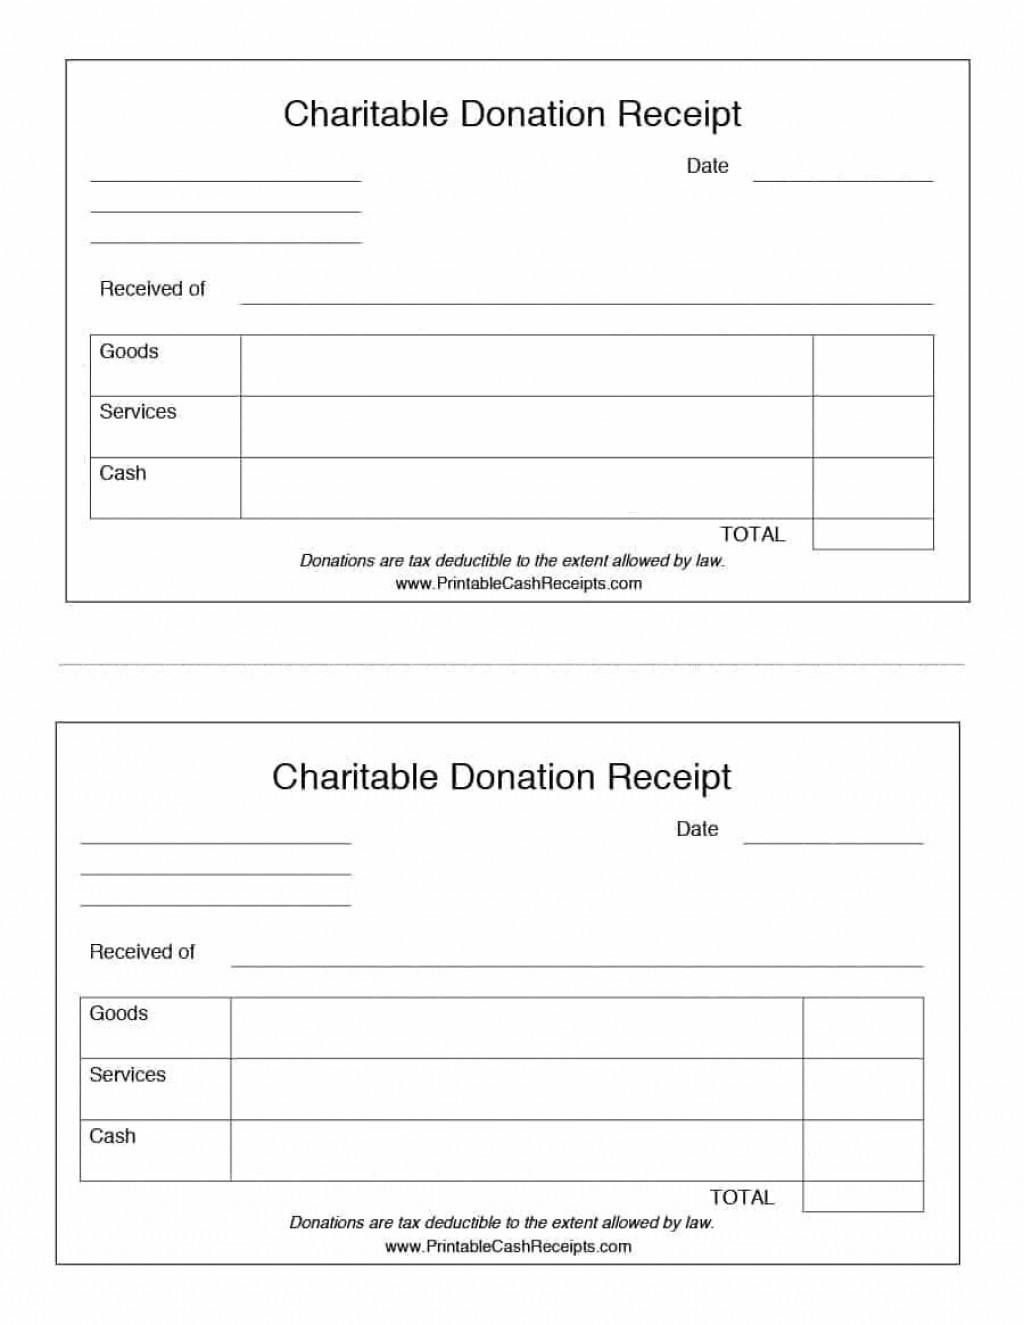 000 Singular Tax Donation Form Template High Definition  Ir Charitable Receipt Deductible ExampleLarge